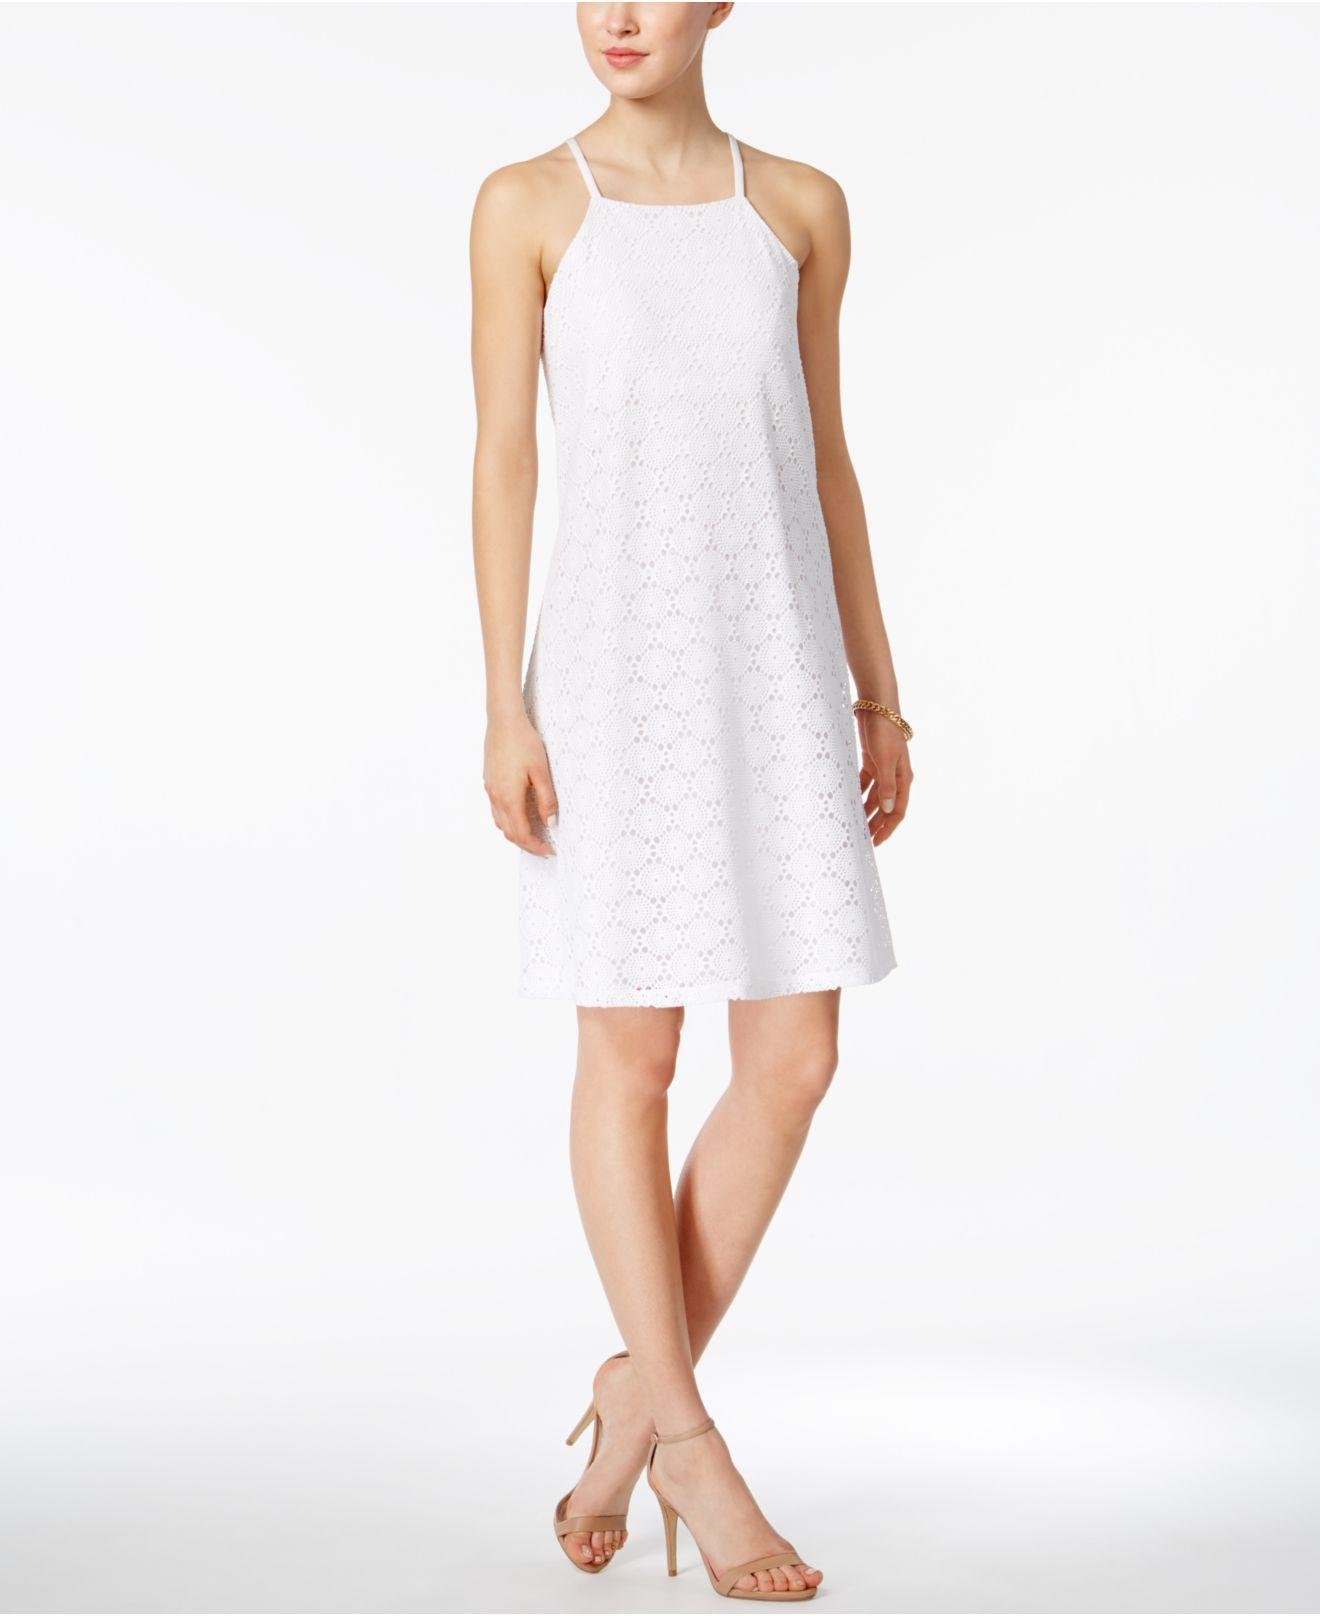 White apron macy's - Nine West Women S White Lace Apron